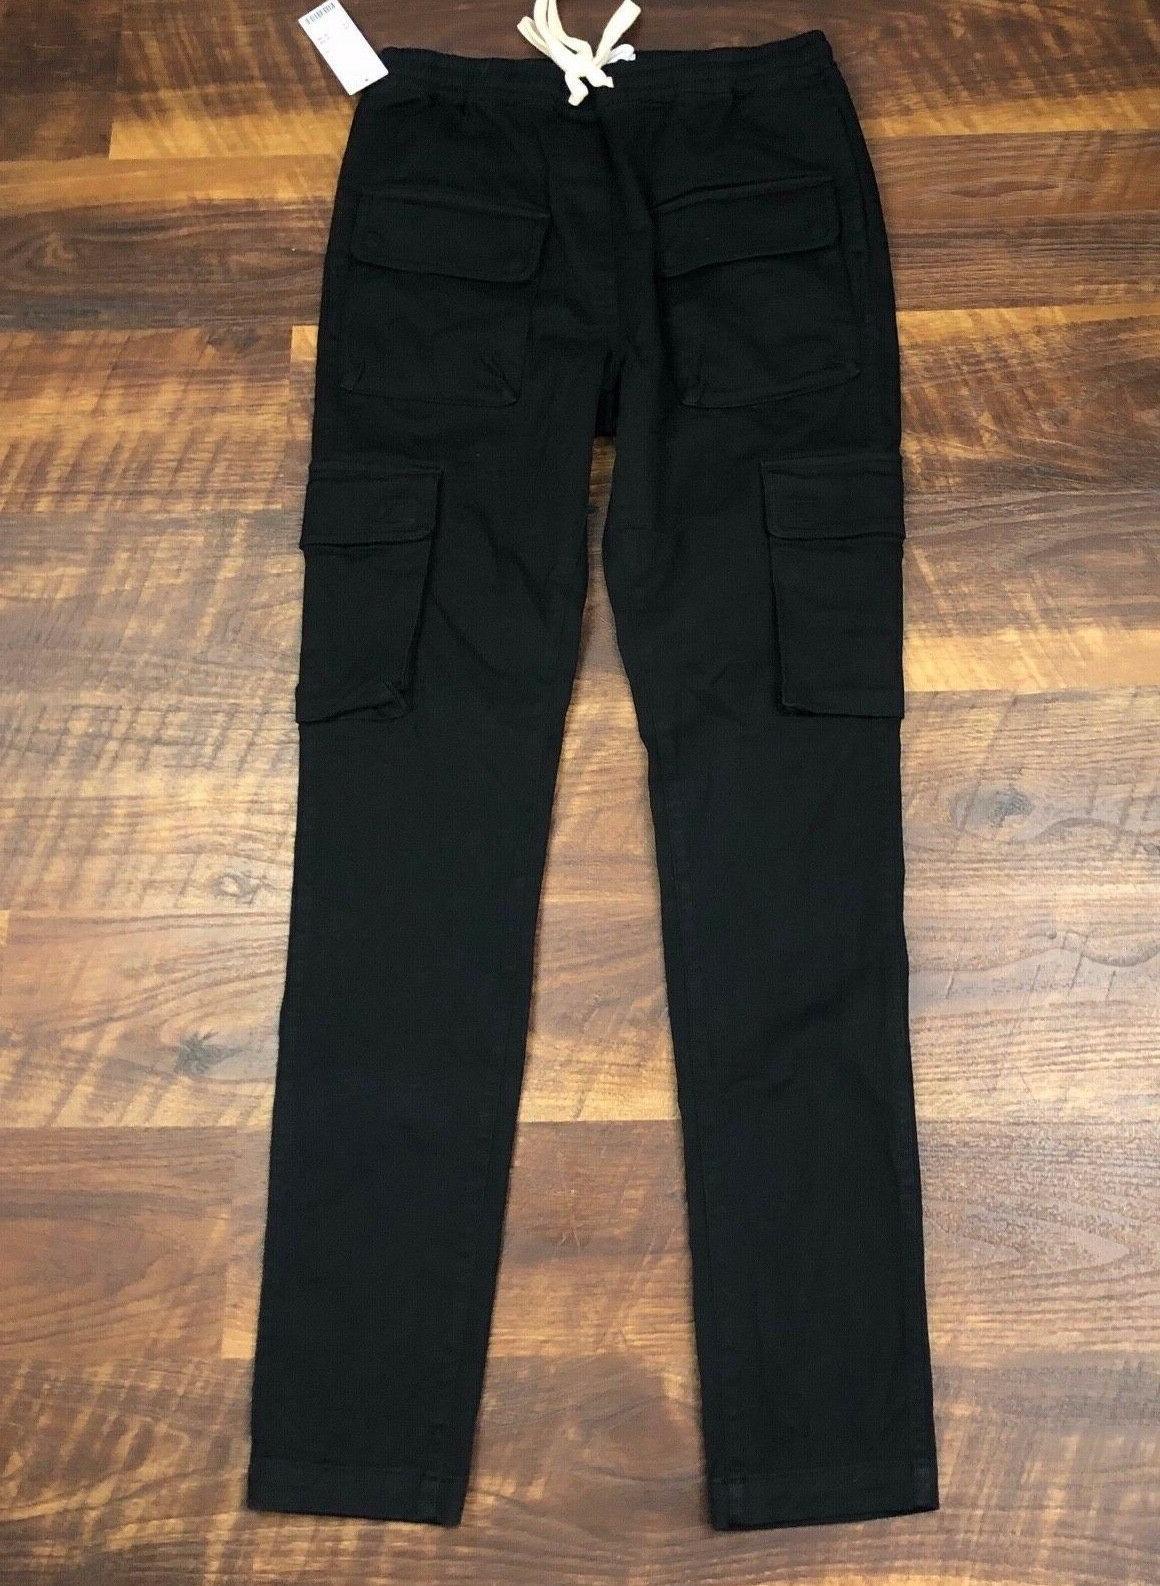 Cloth Jayden Skinny Men's Casual Pants